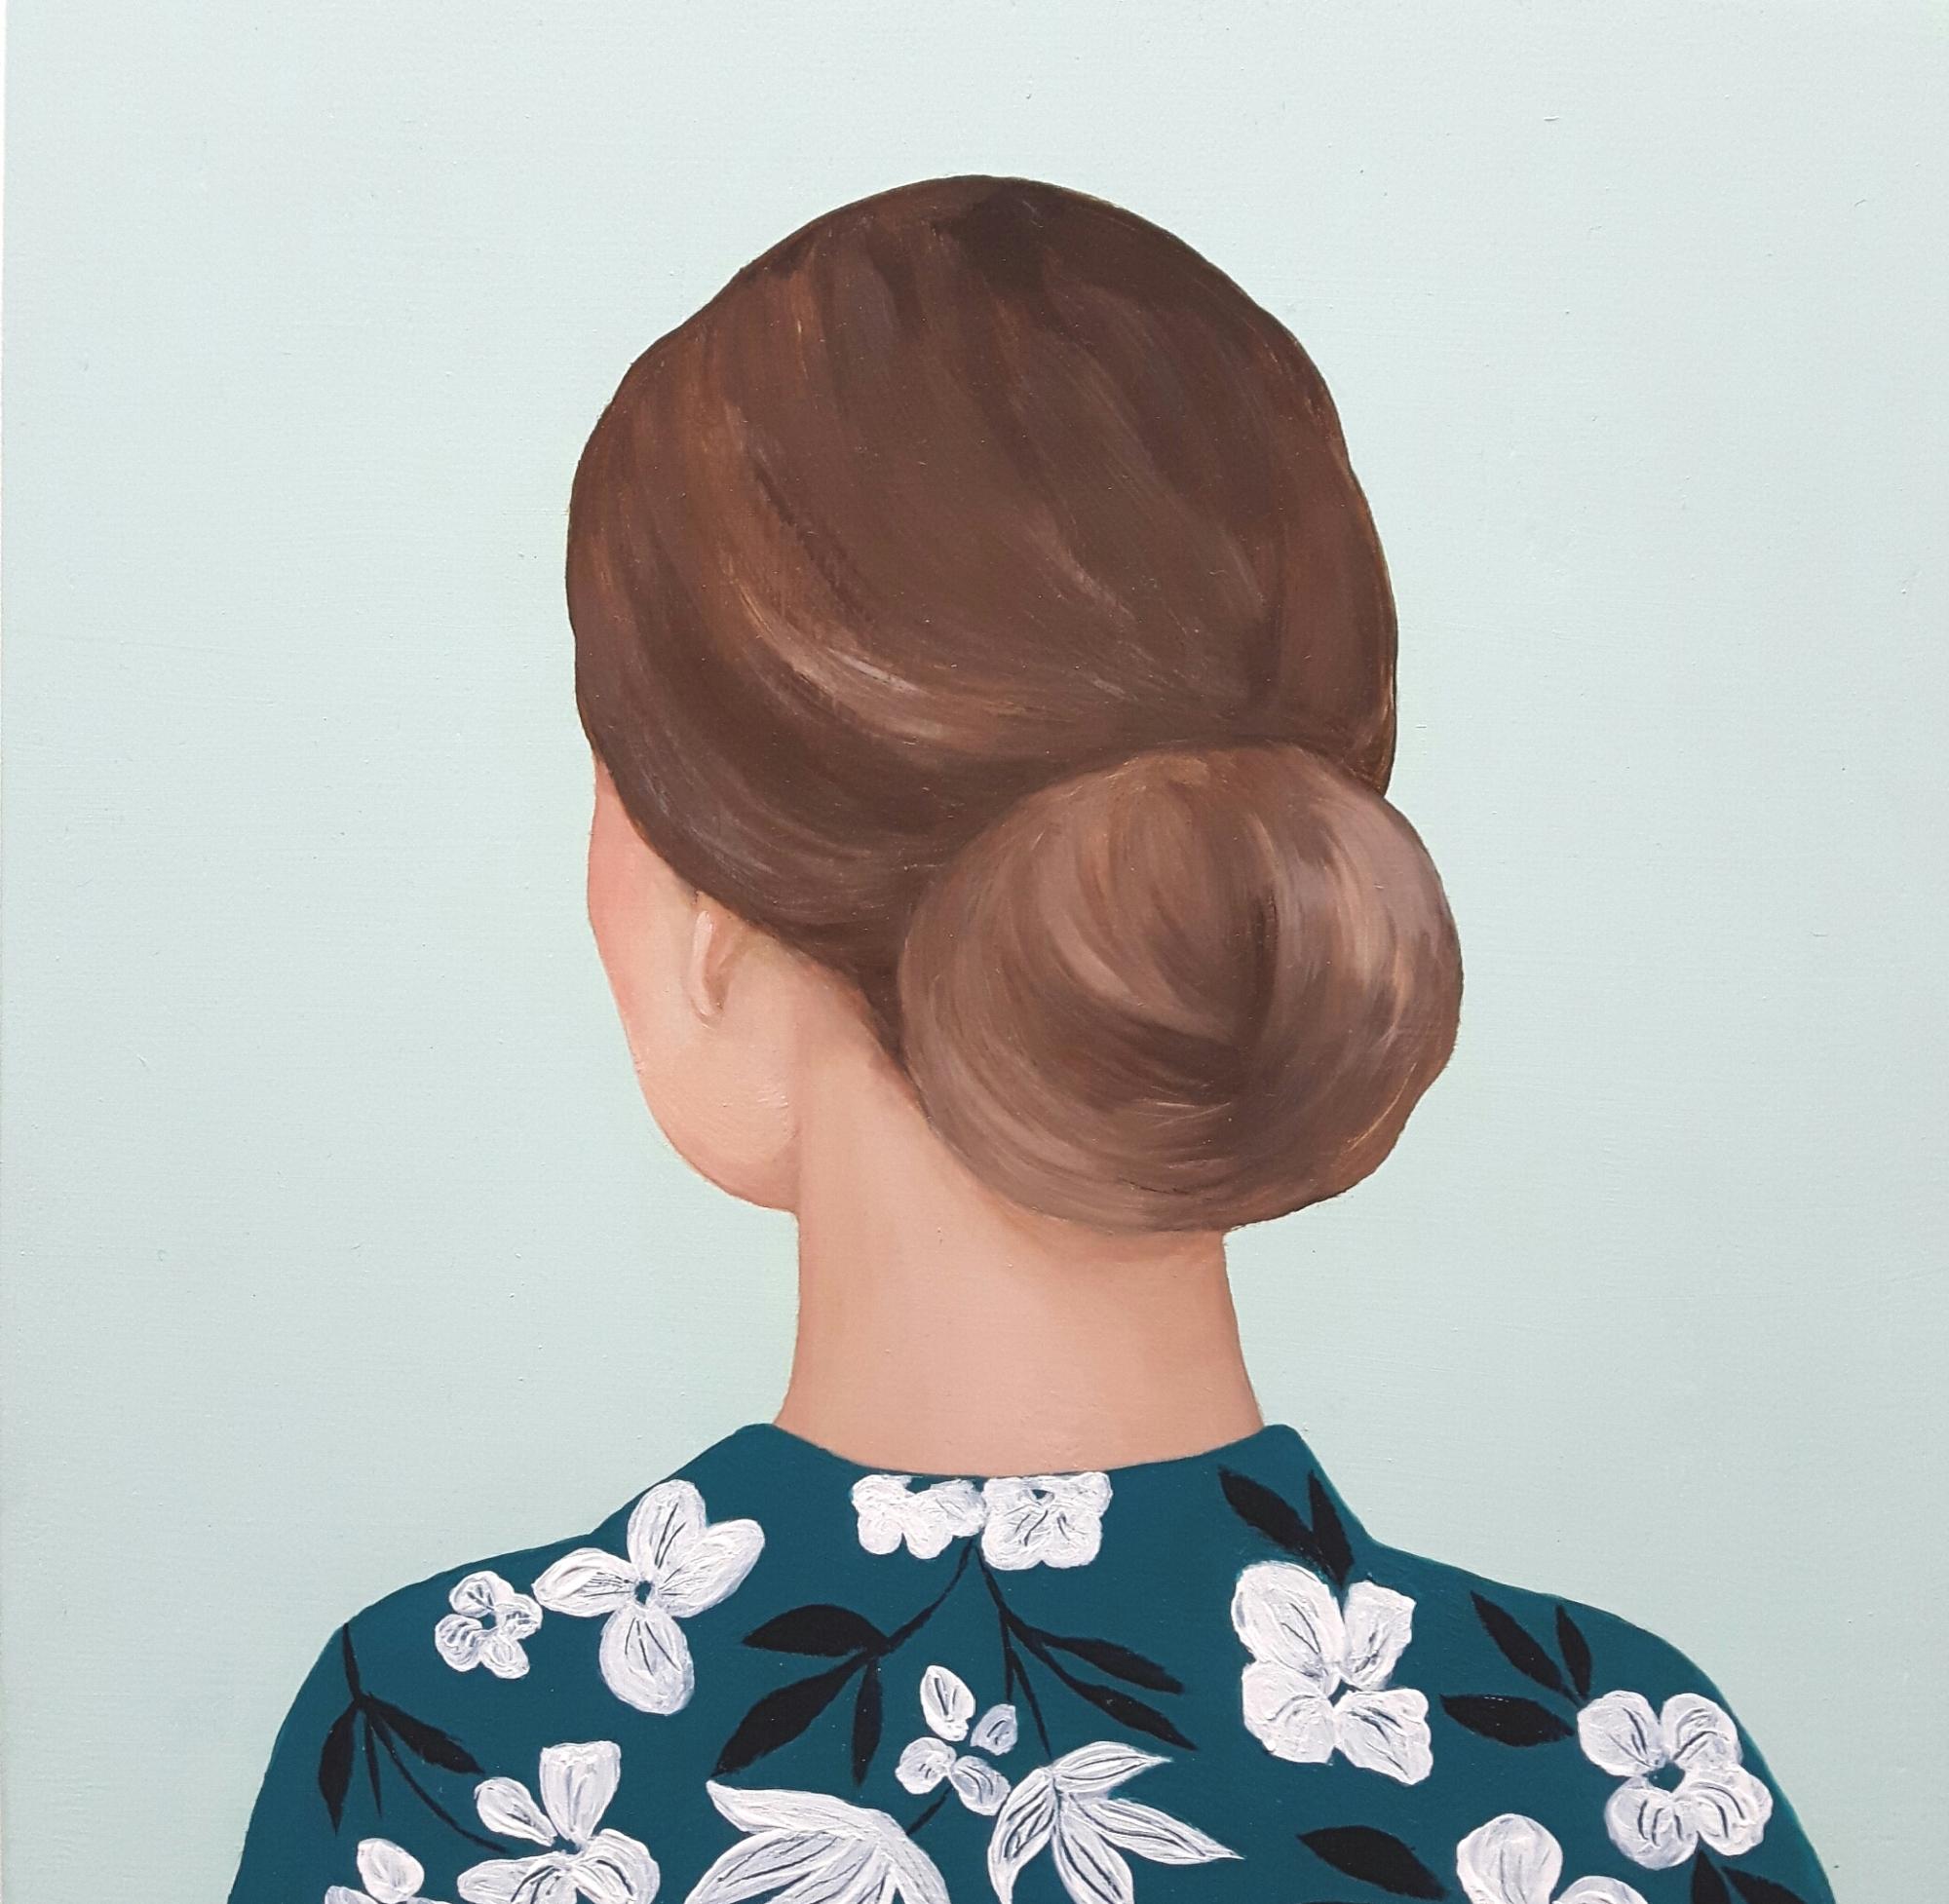 Girl in Flowery Shirt by Marina  Nazarova